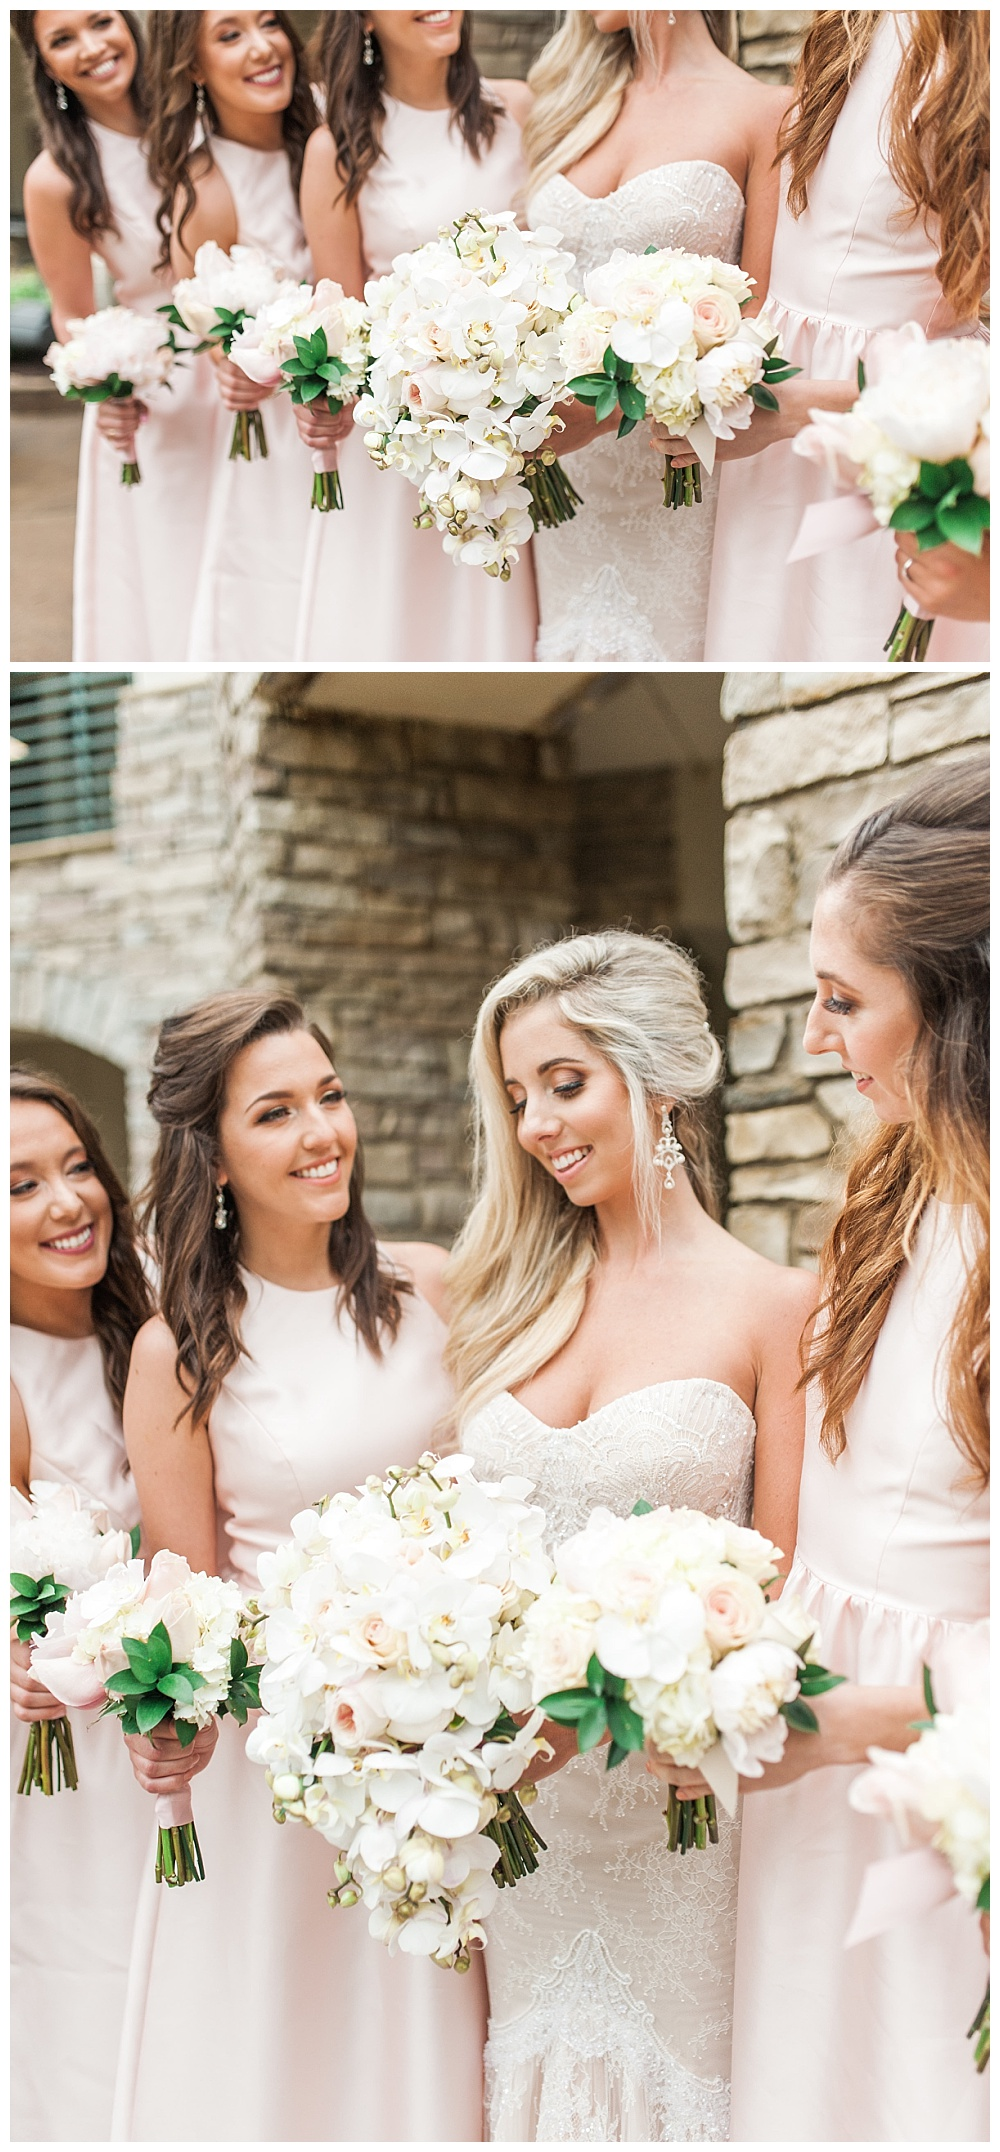 Stephanie Marie Photography TPC Deere Run Quad Cities Iowa City Wedding Photographer Ben Erin Dittmer_0034.jpg